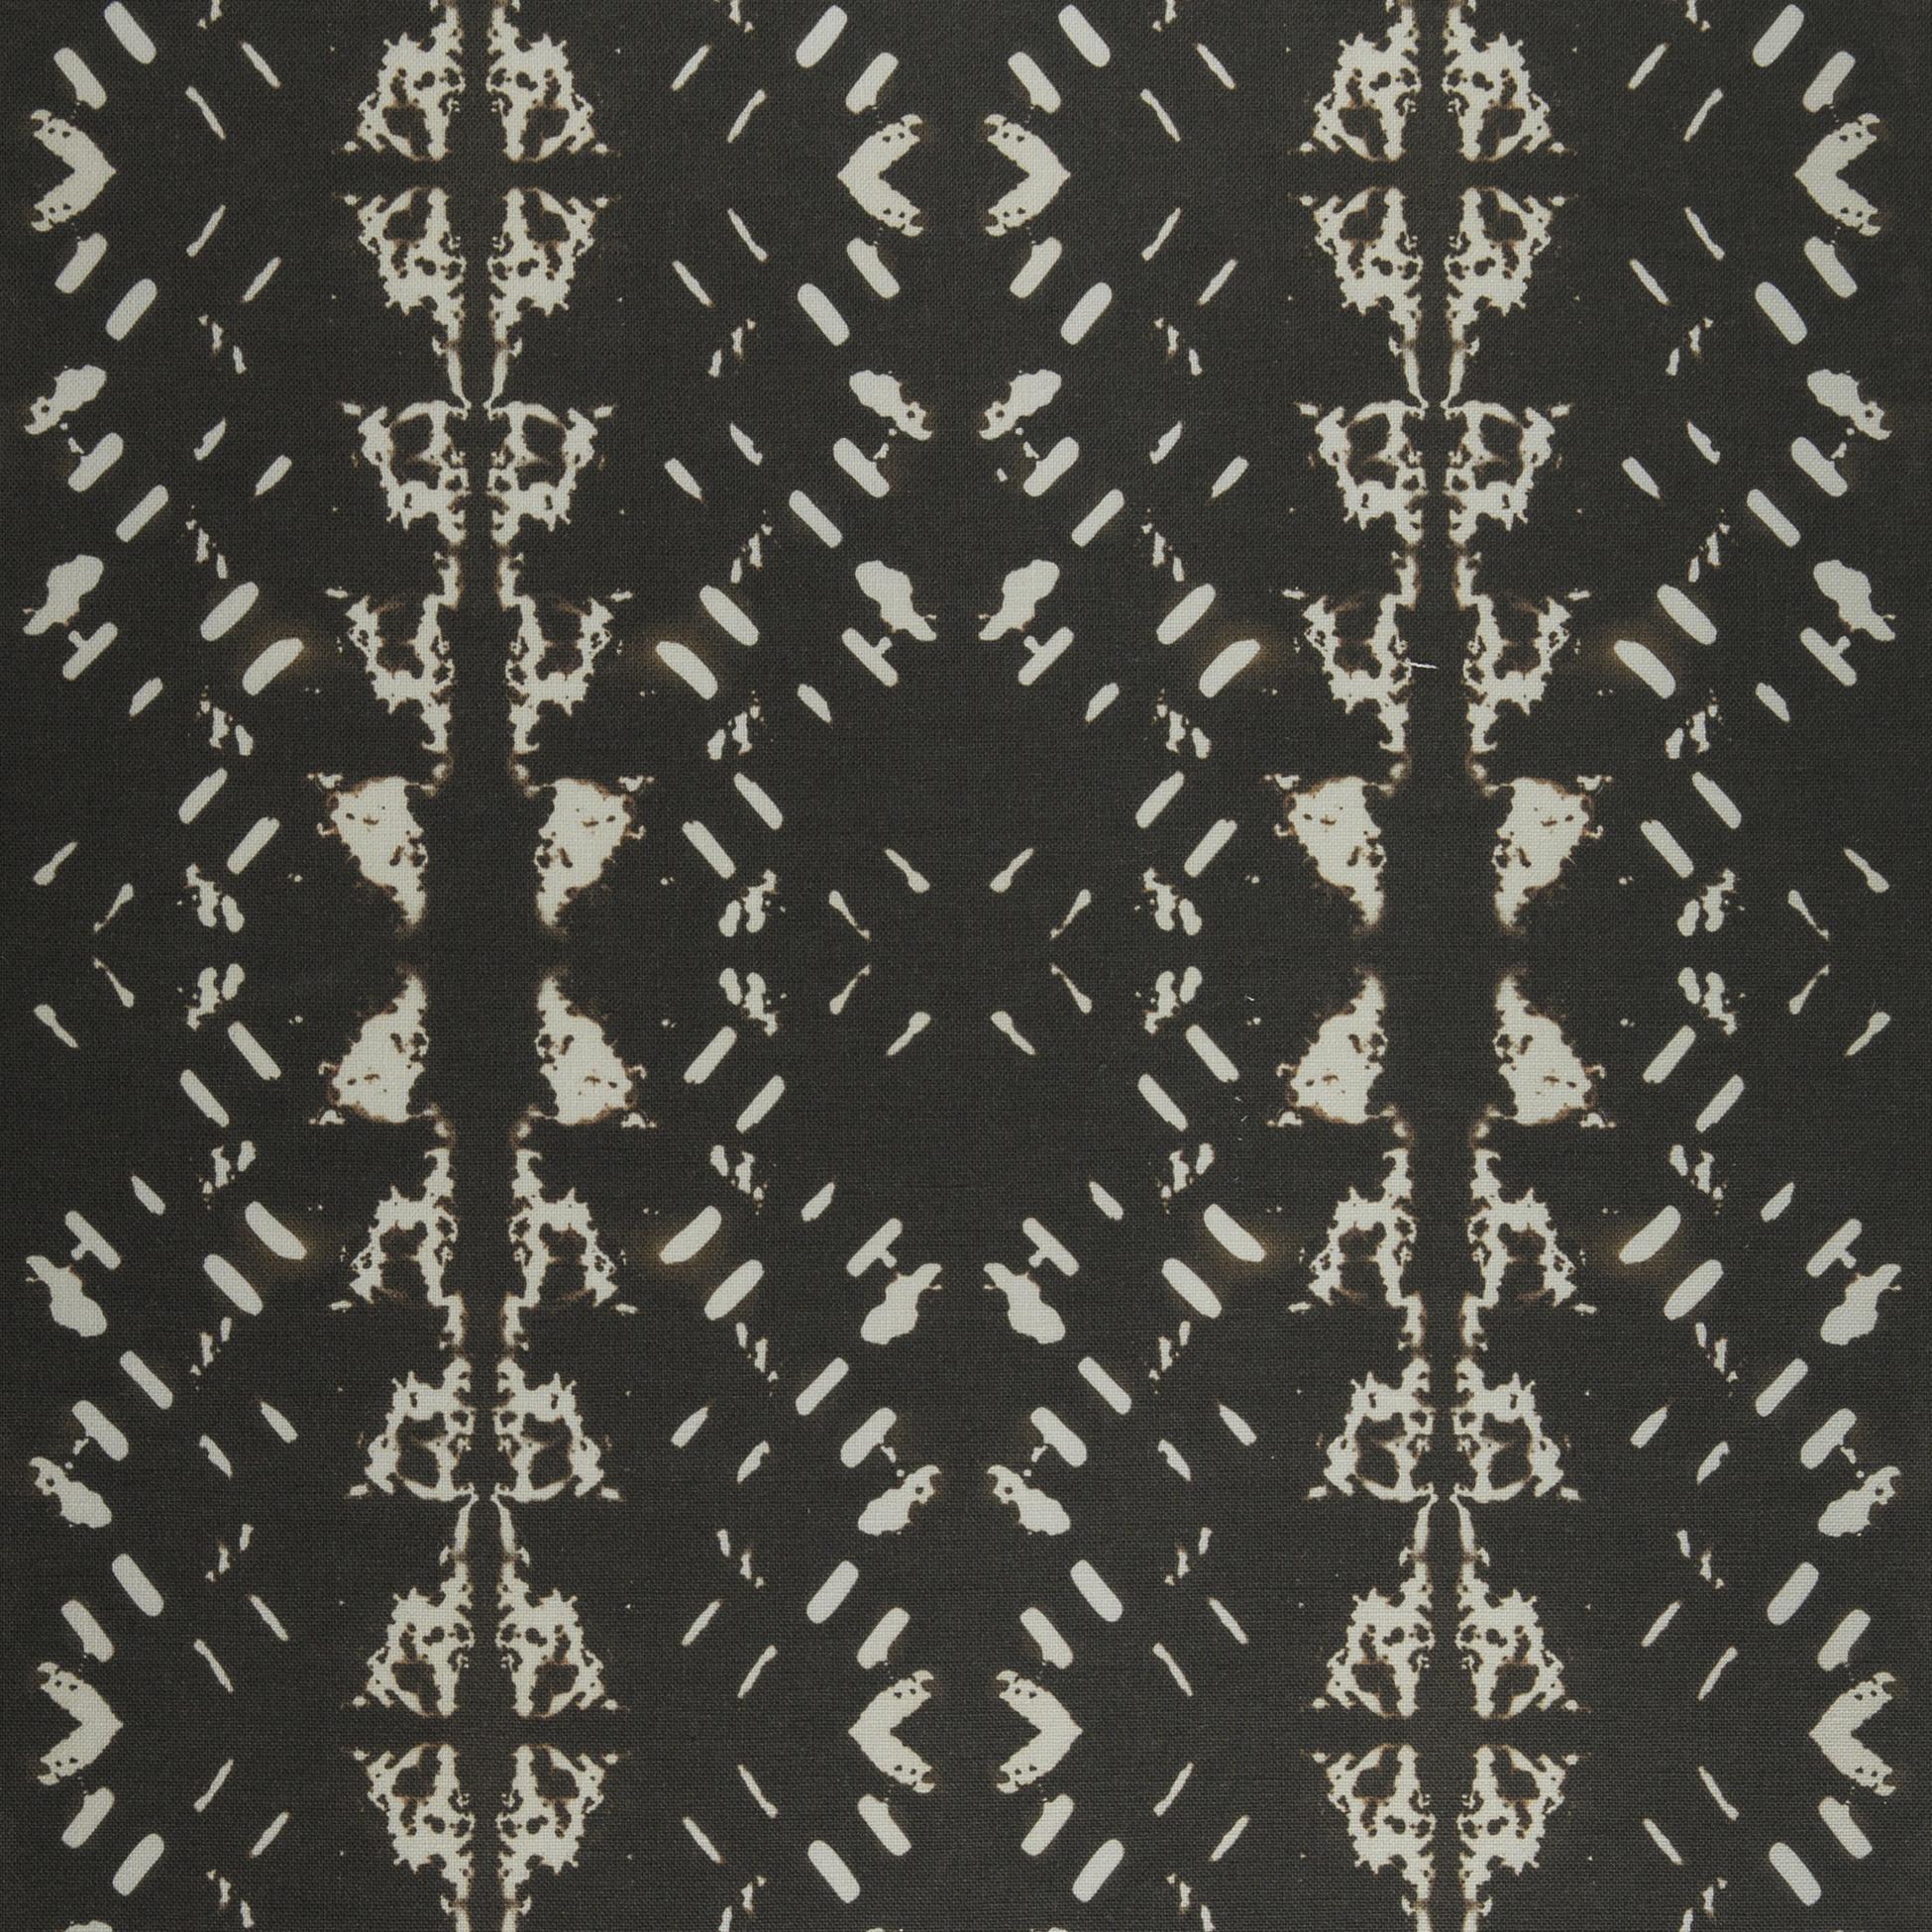 Native Embers Black Fabric Repeat